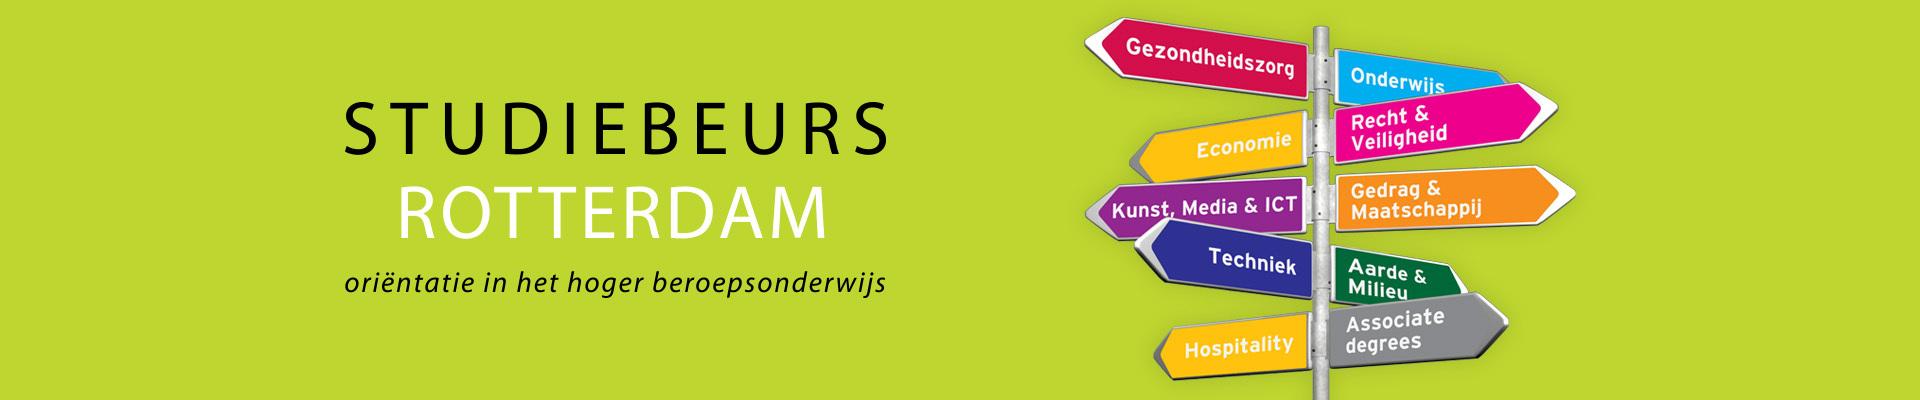 Studiebeurs Rotterdam